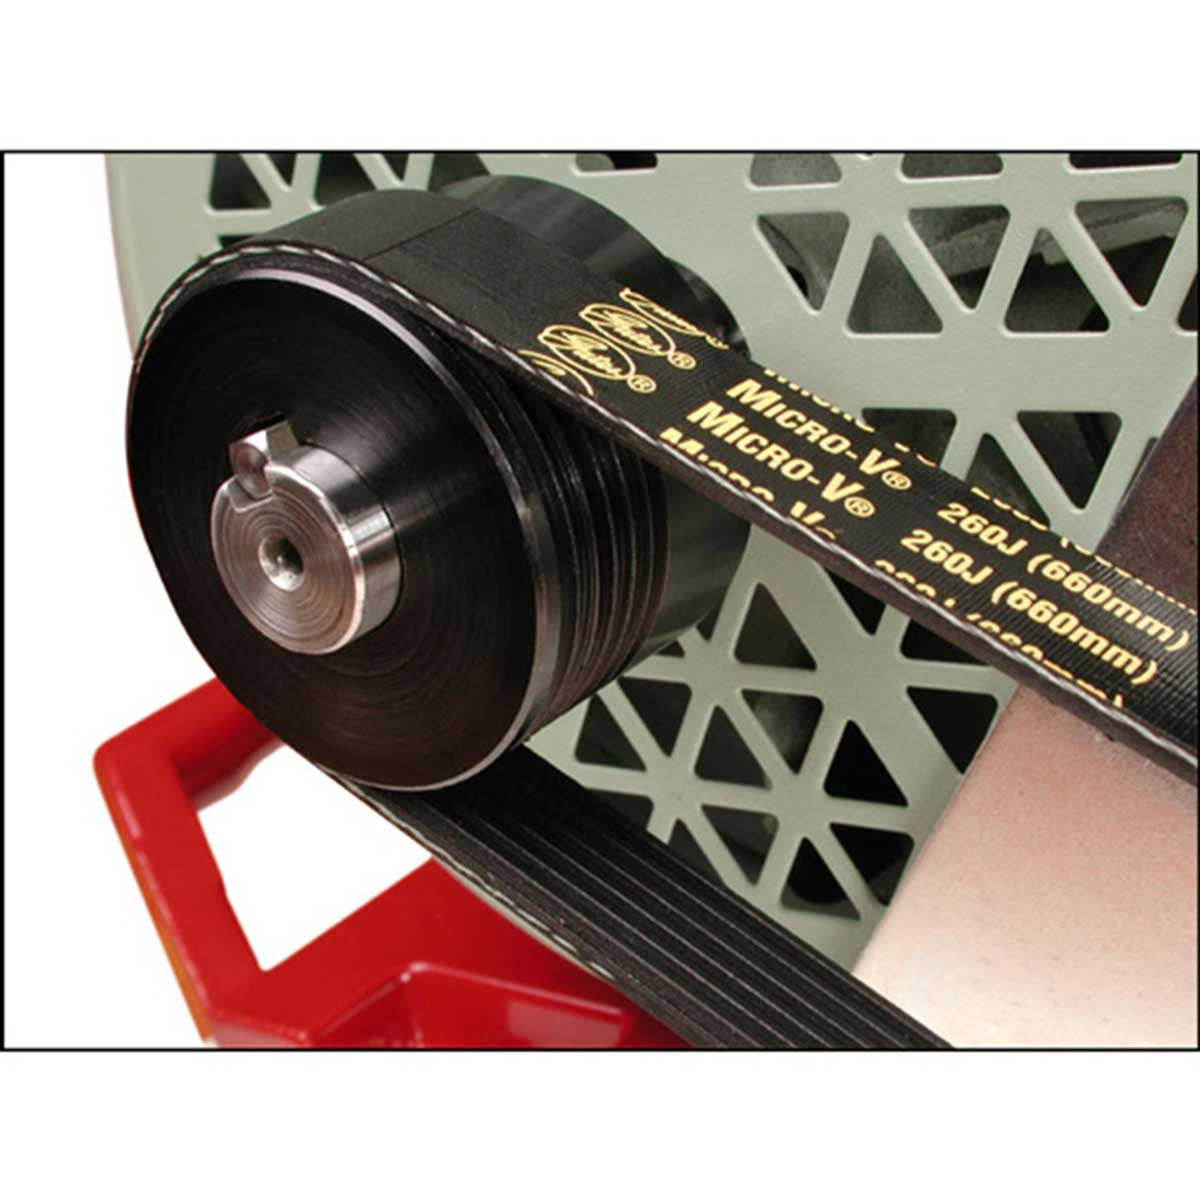 MK-101 tile saw drive belt